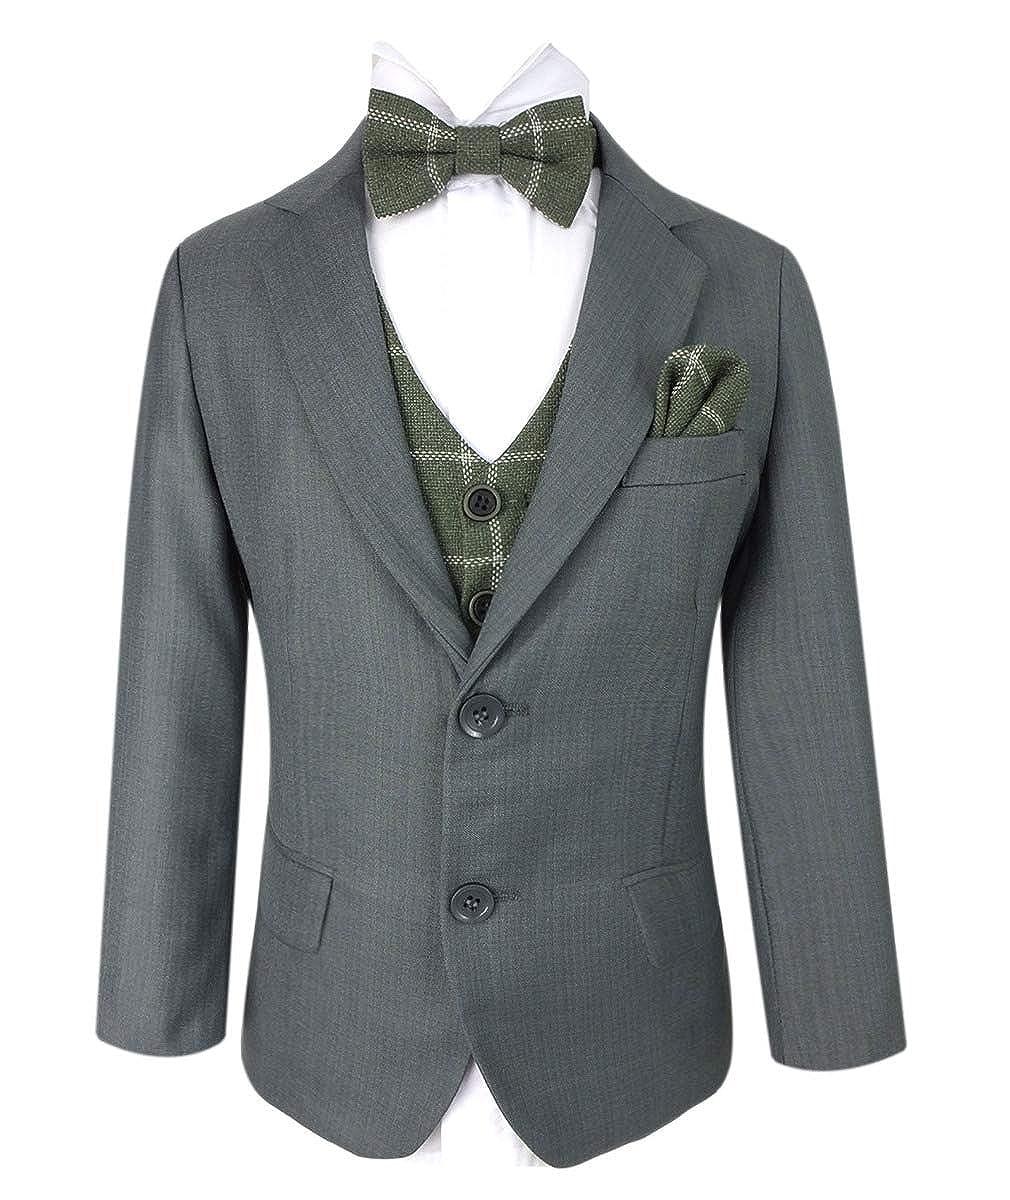 Boys Cavani Slim Fit Ivory Grey Suit Set Pageboy Wedding Prom Party Communion